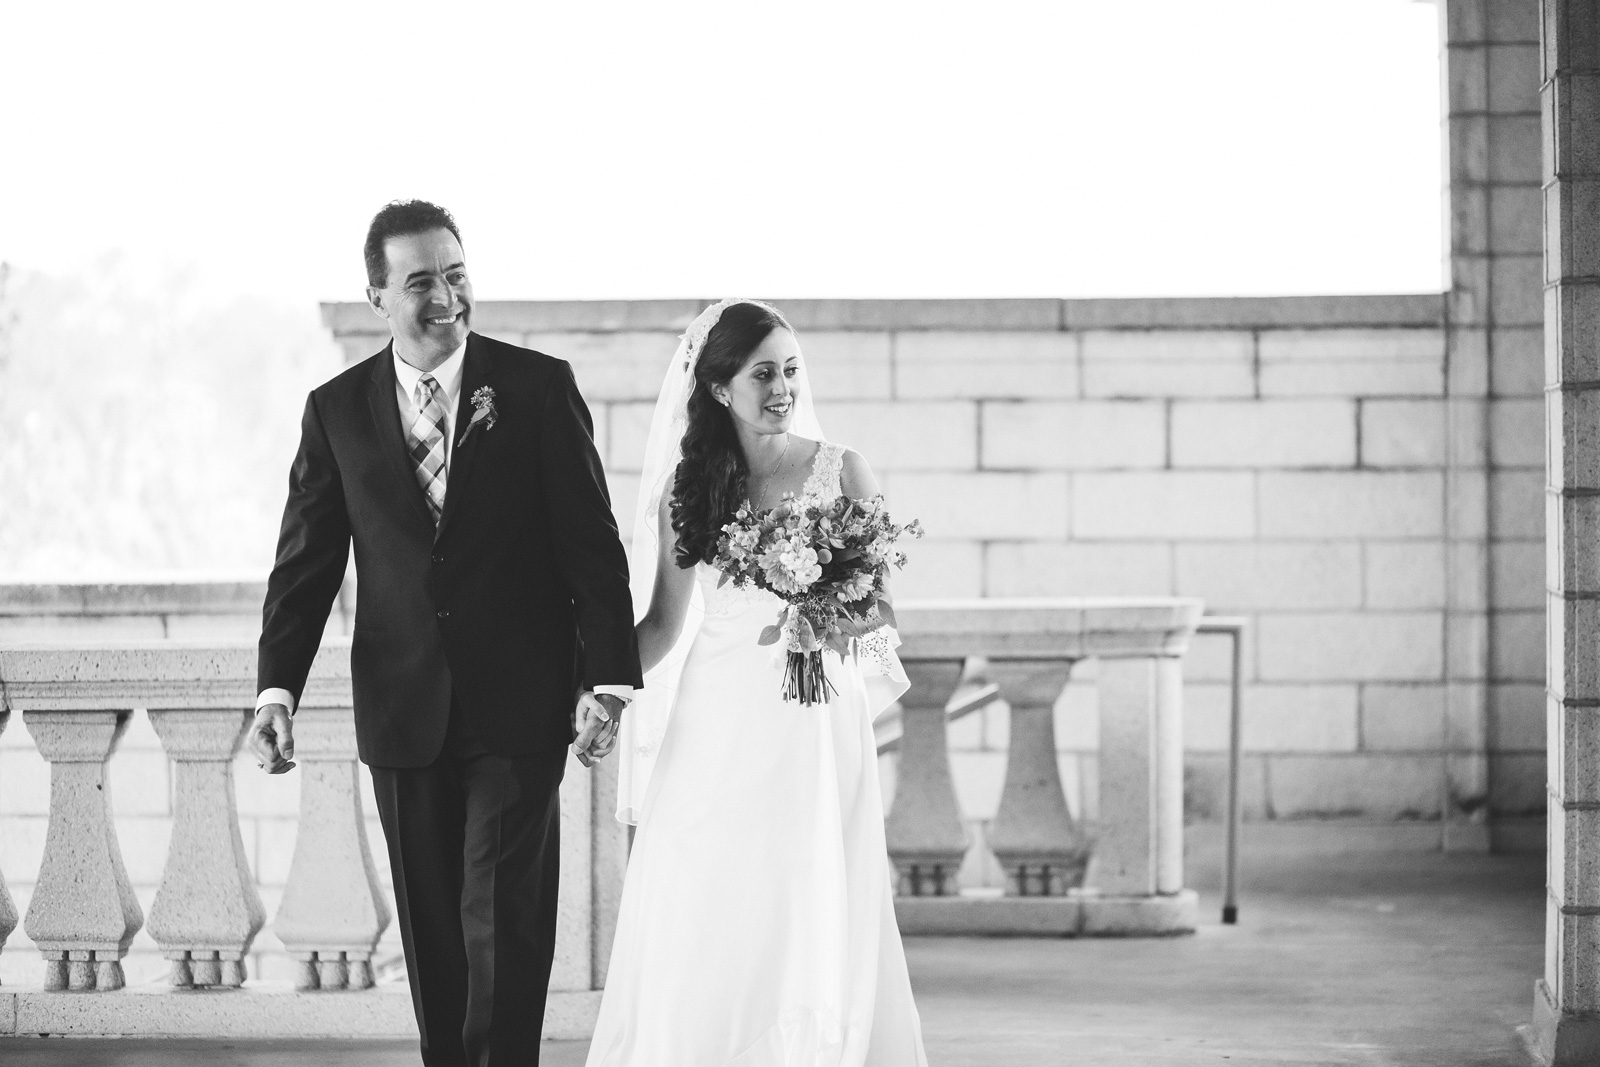 Chicago Destination Wedding Photographer - Outdoor Indiana Beach ...